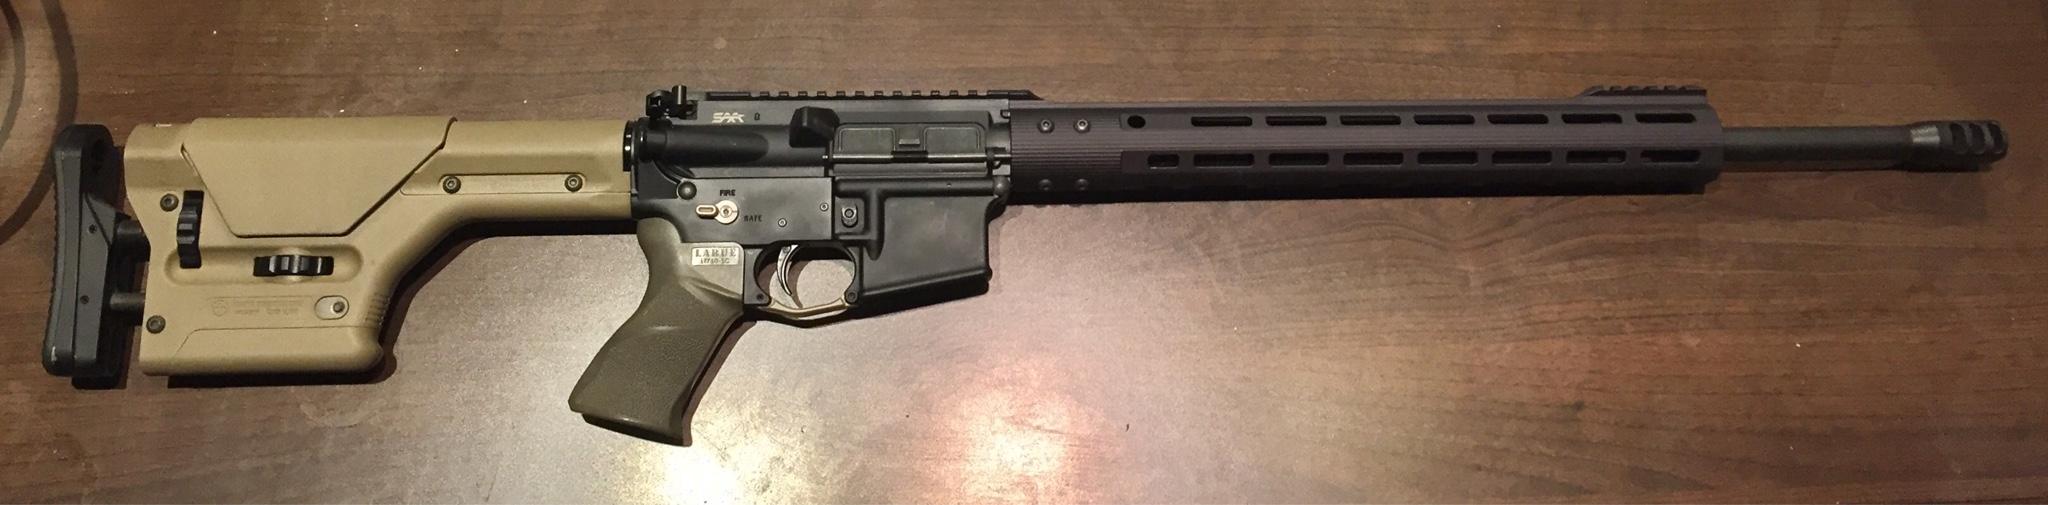 6 5 Grendel AR-15 Upper / Complete Rifle  Premium match grade